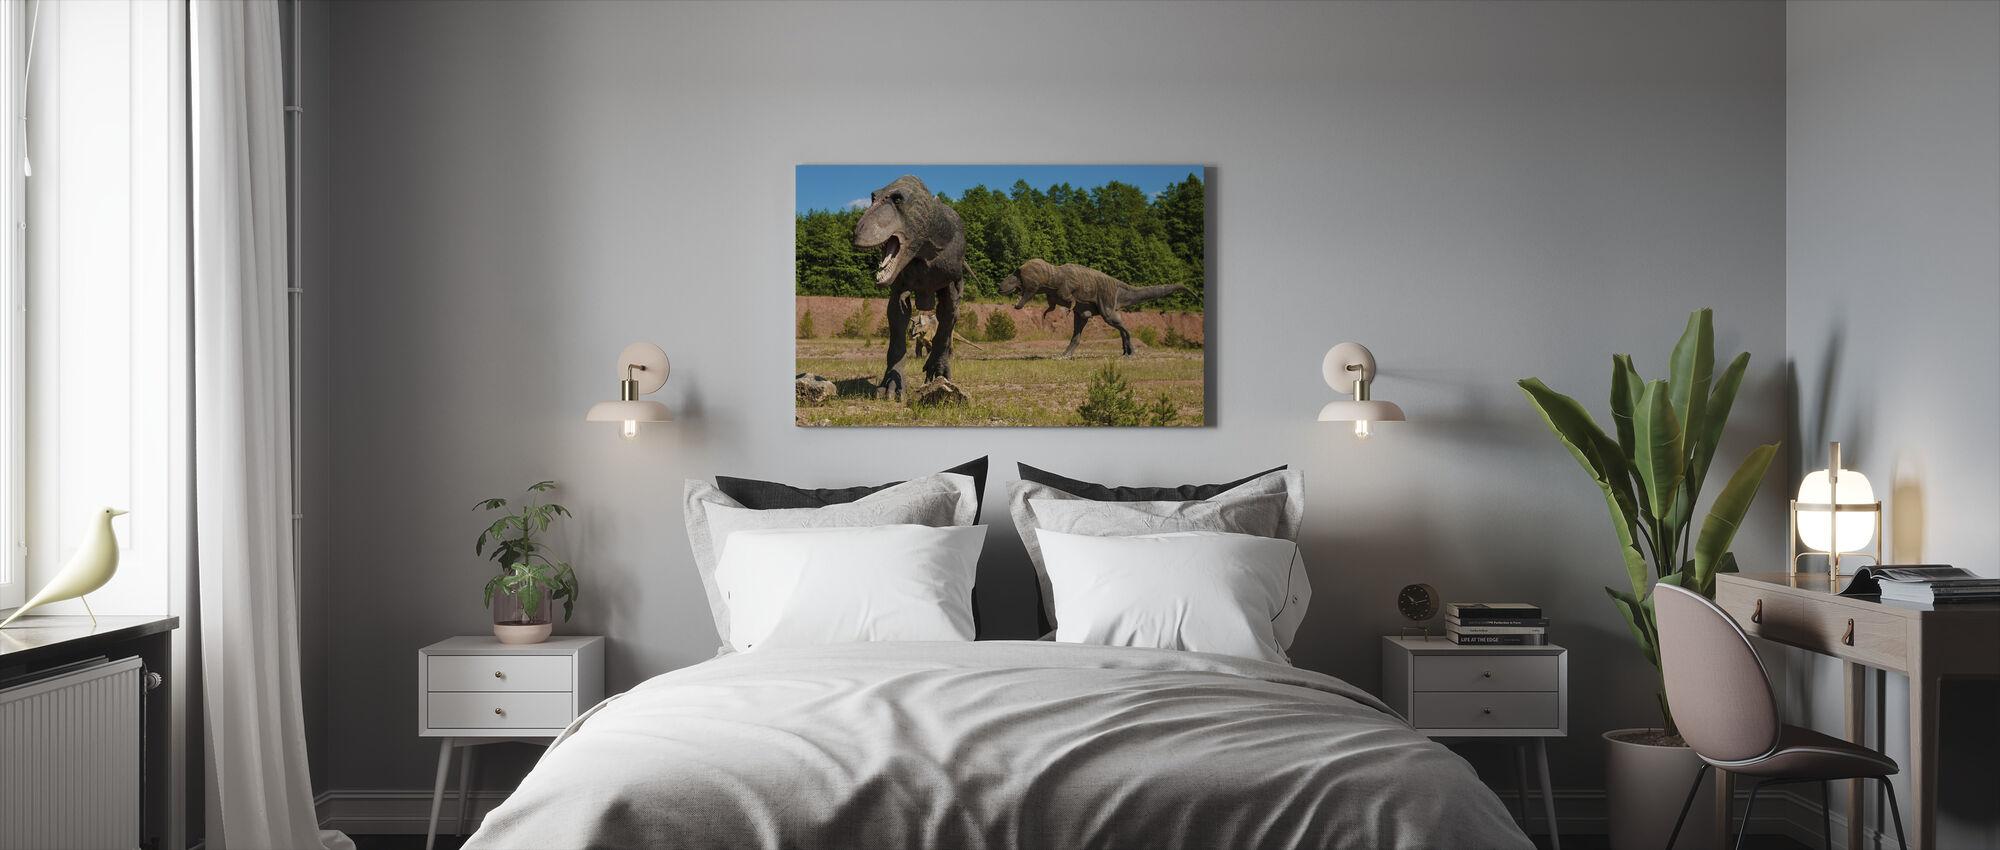 Monstruösa dinosaurie - Canvastavla - Sovrum